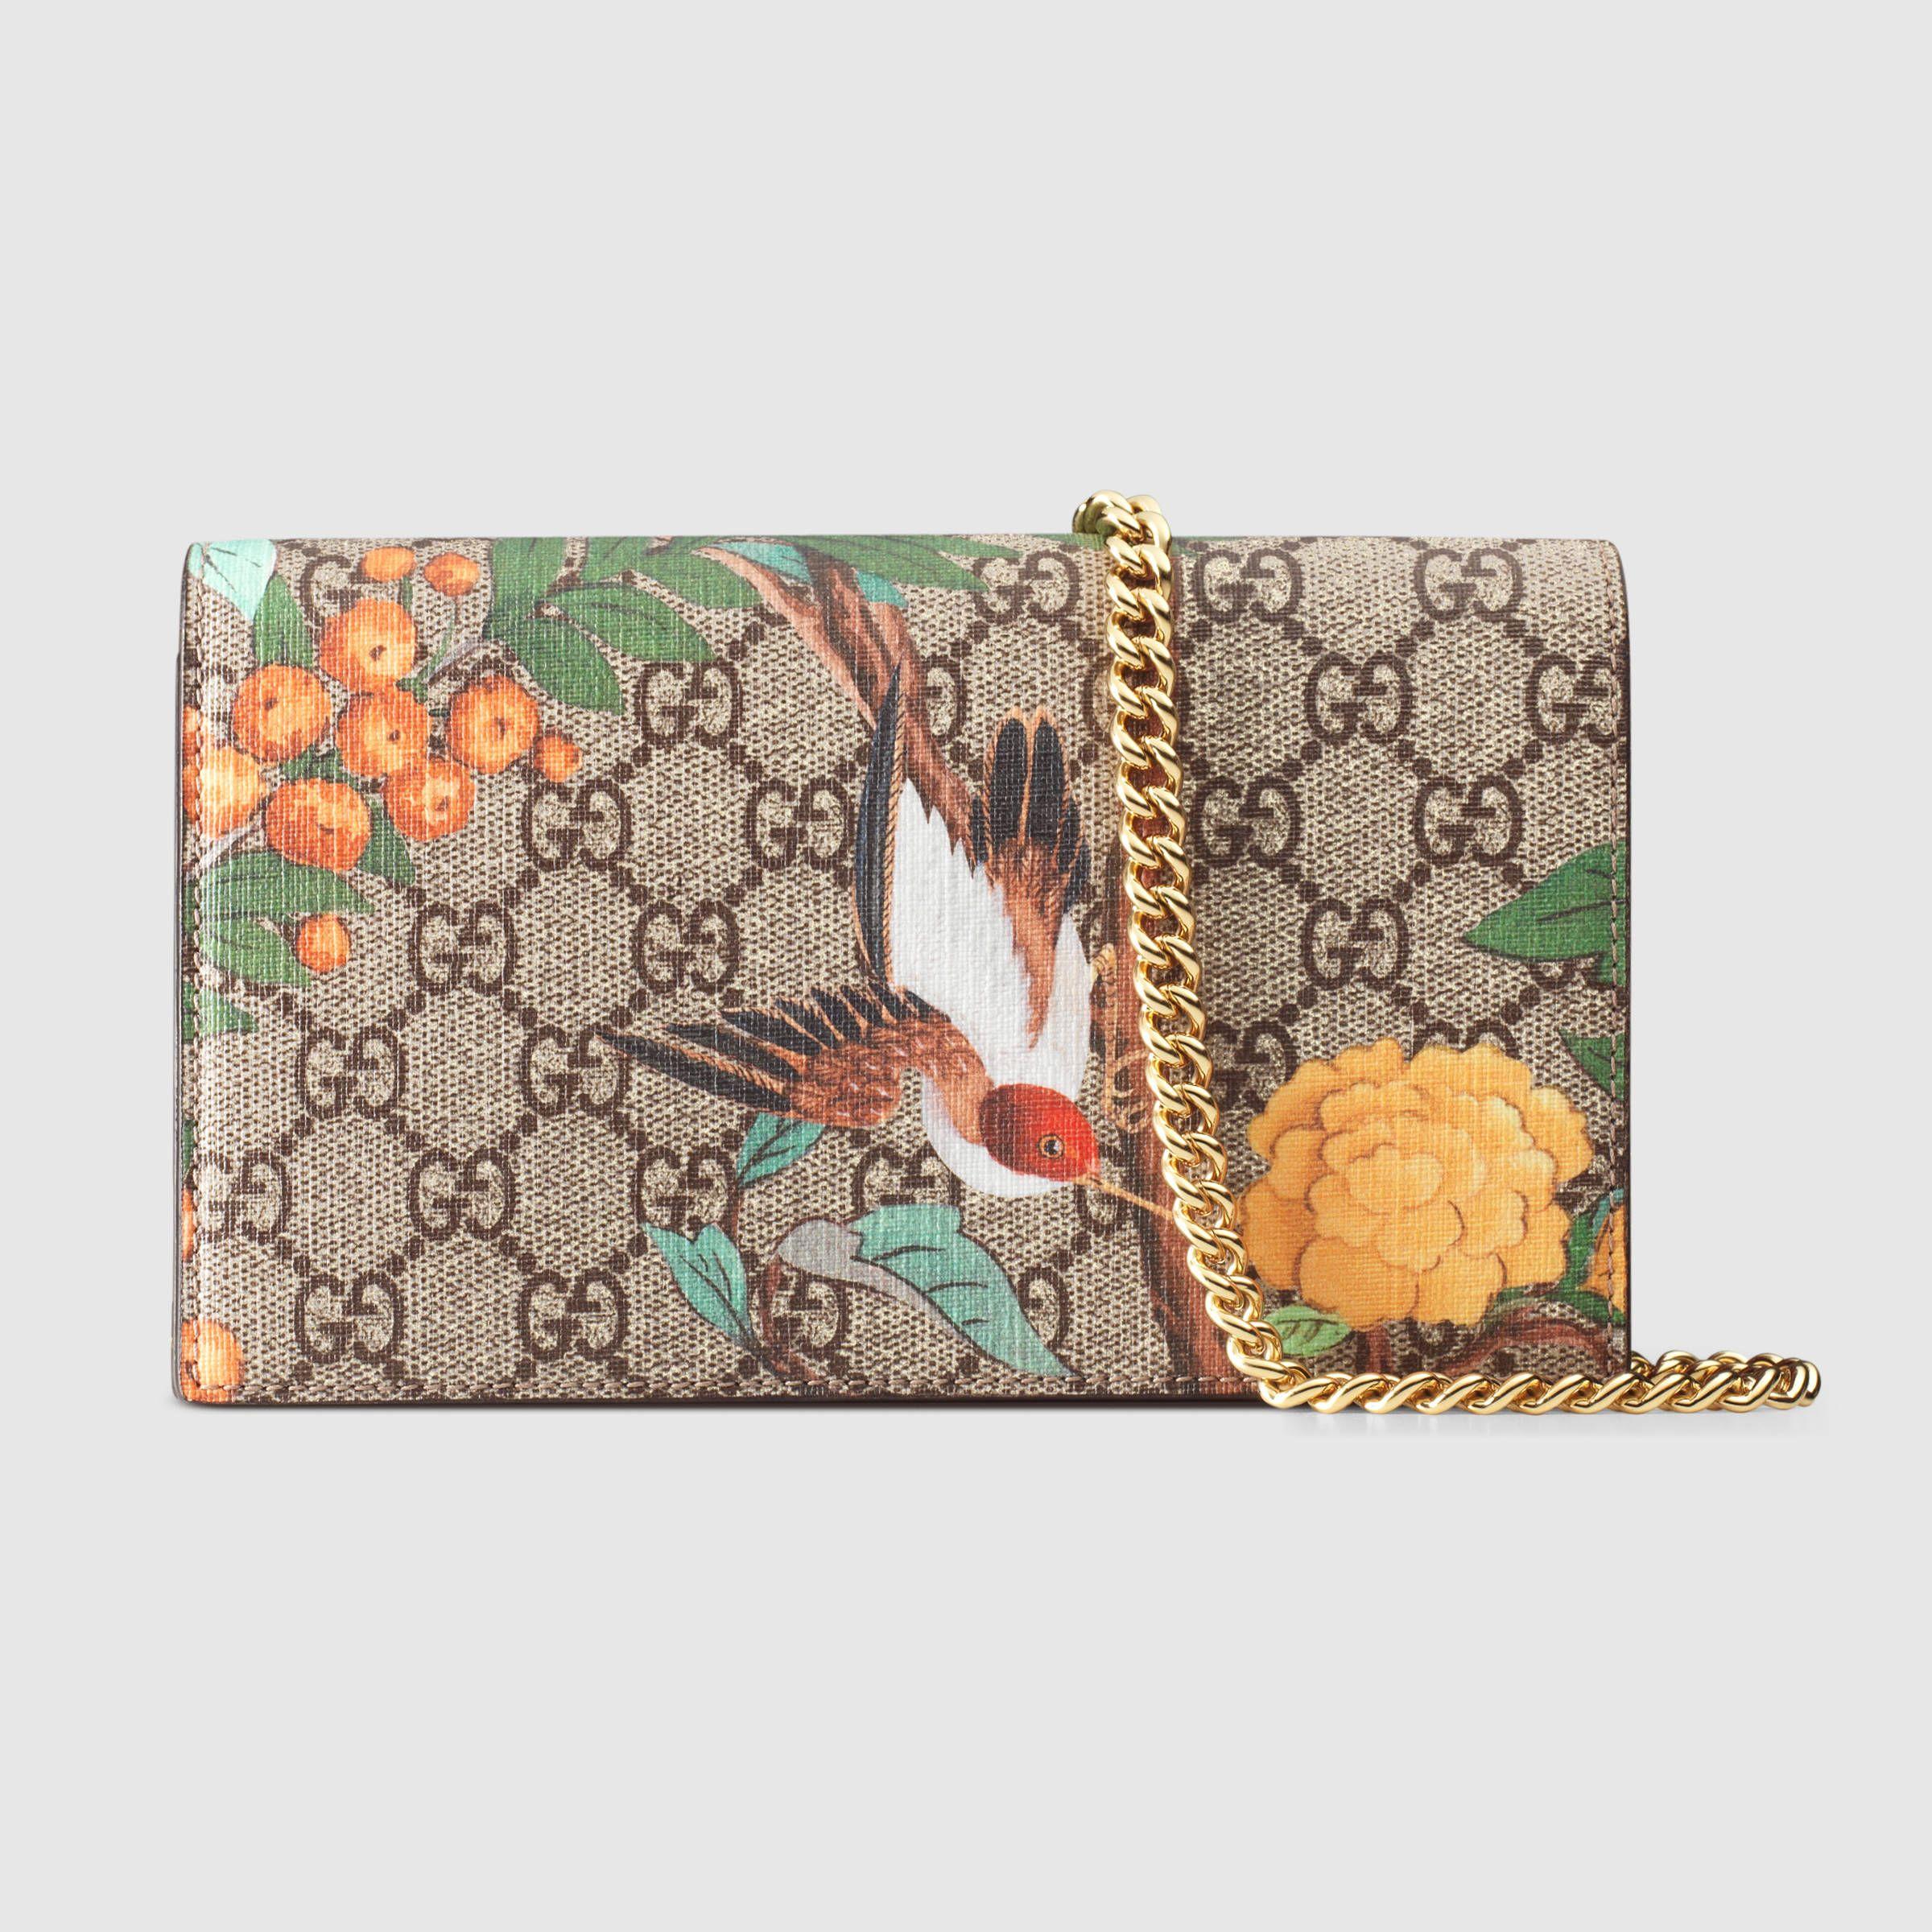 Gucci - Gucci Tian mini chain bag